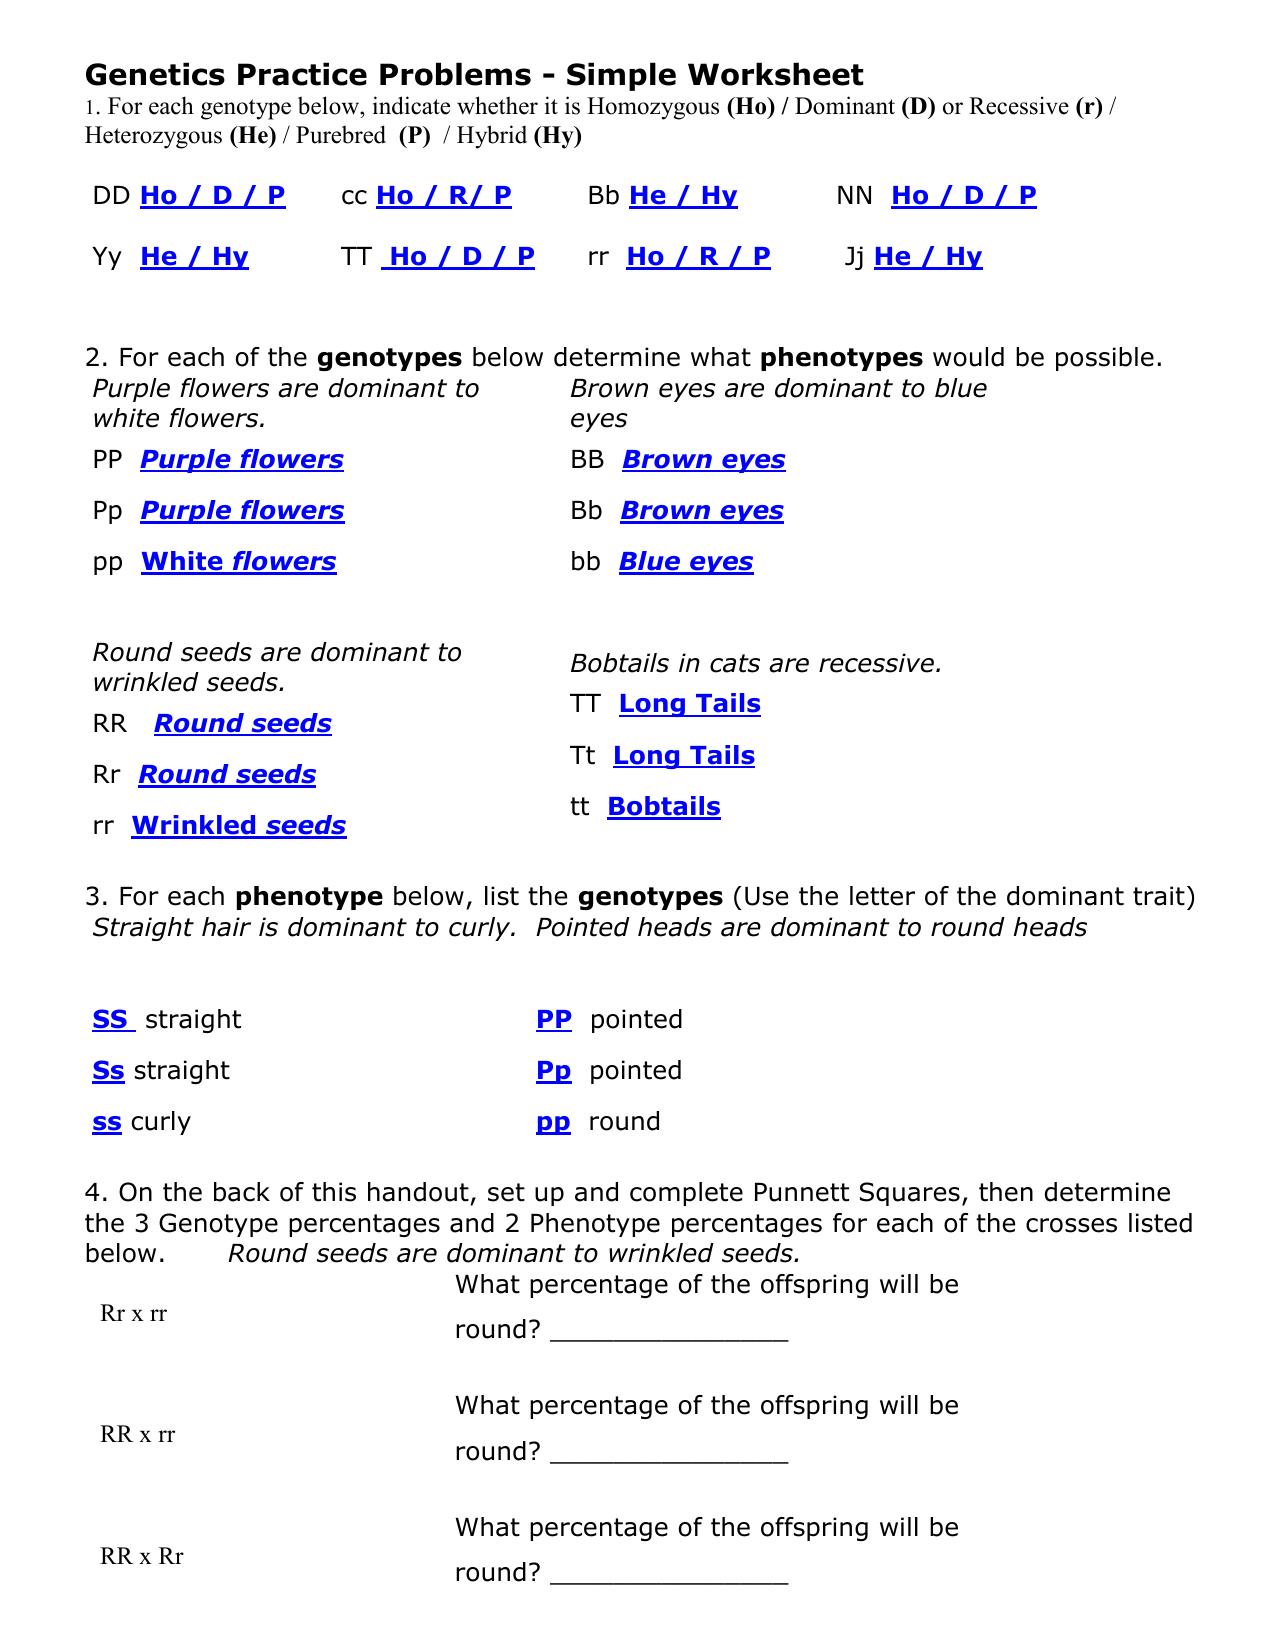 Genetics Practice Problems Simple Worksheet